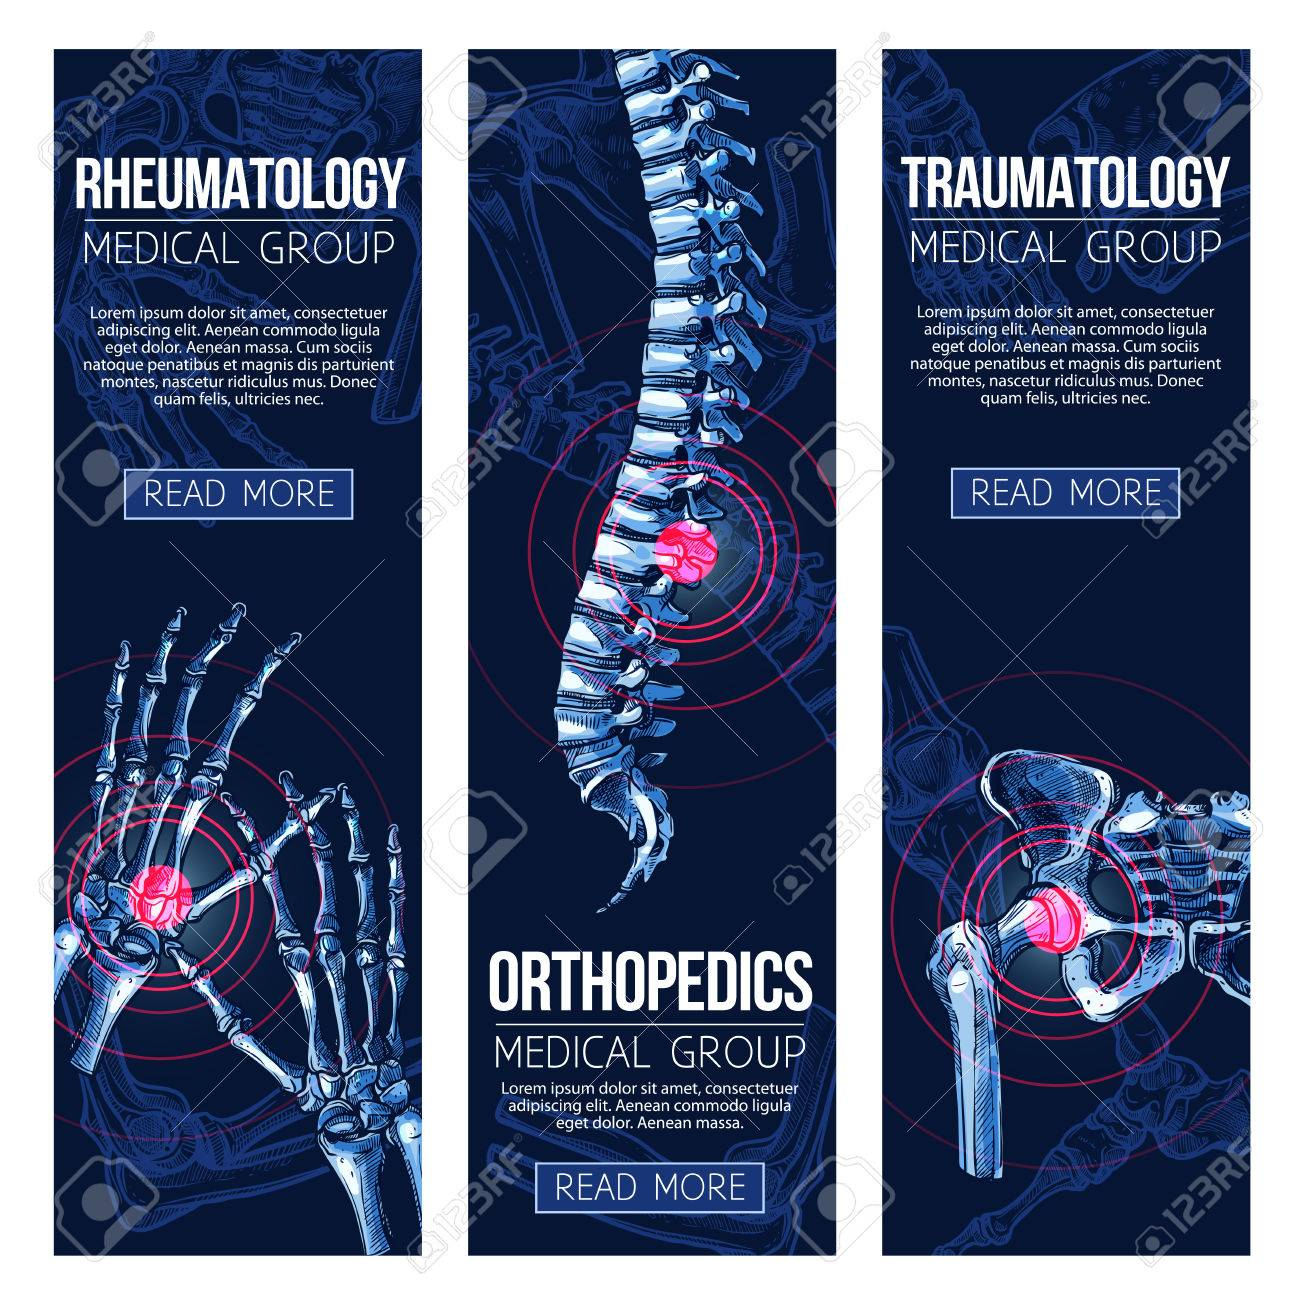 Medical banners for rheumatology and traumatology - 84969612